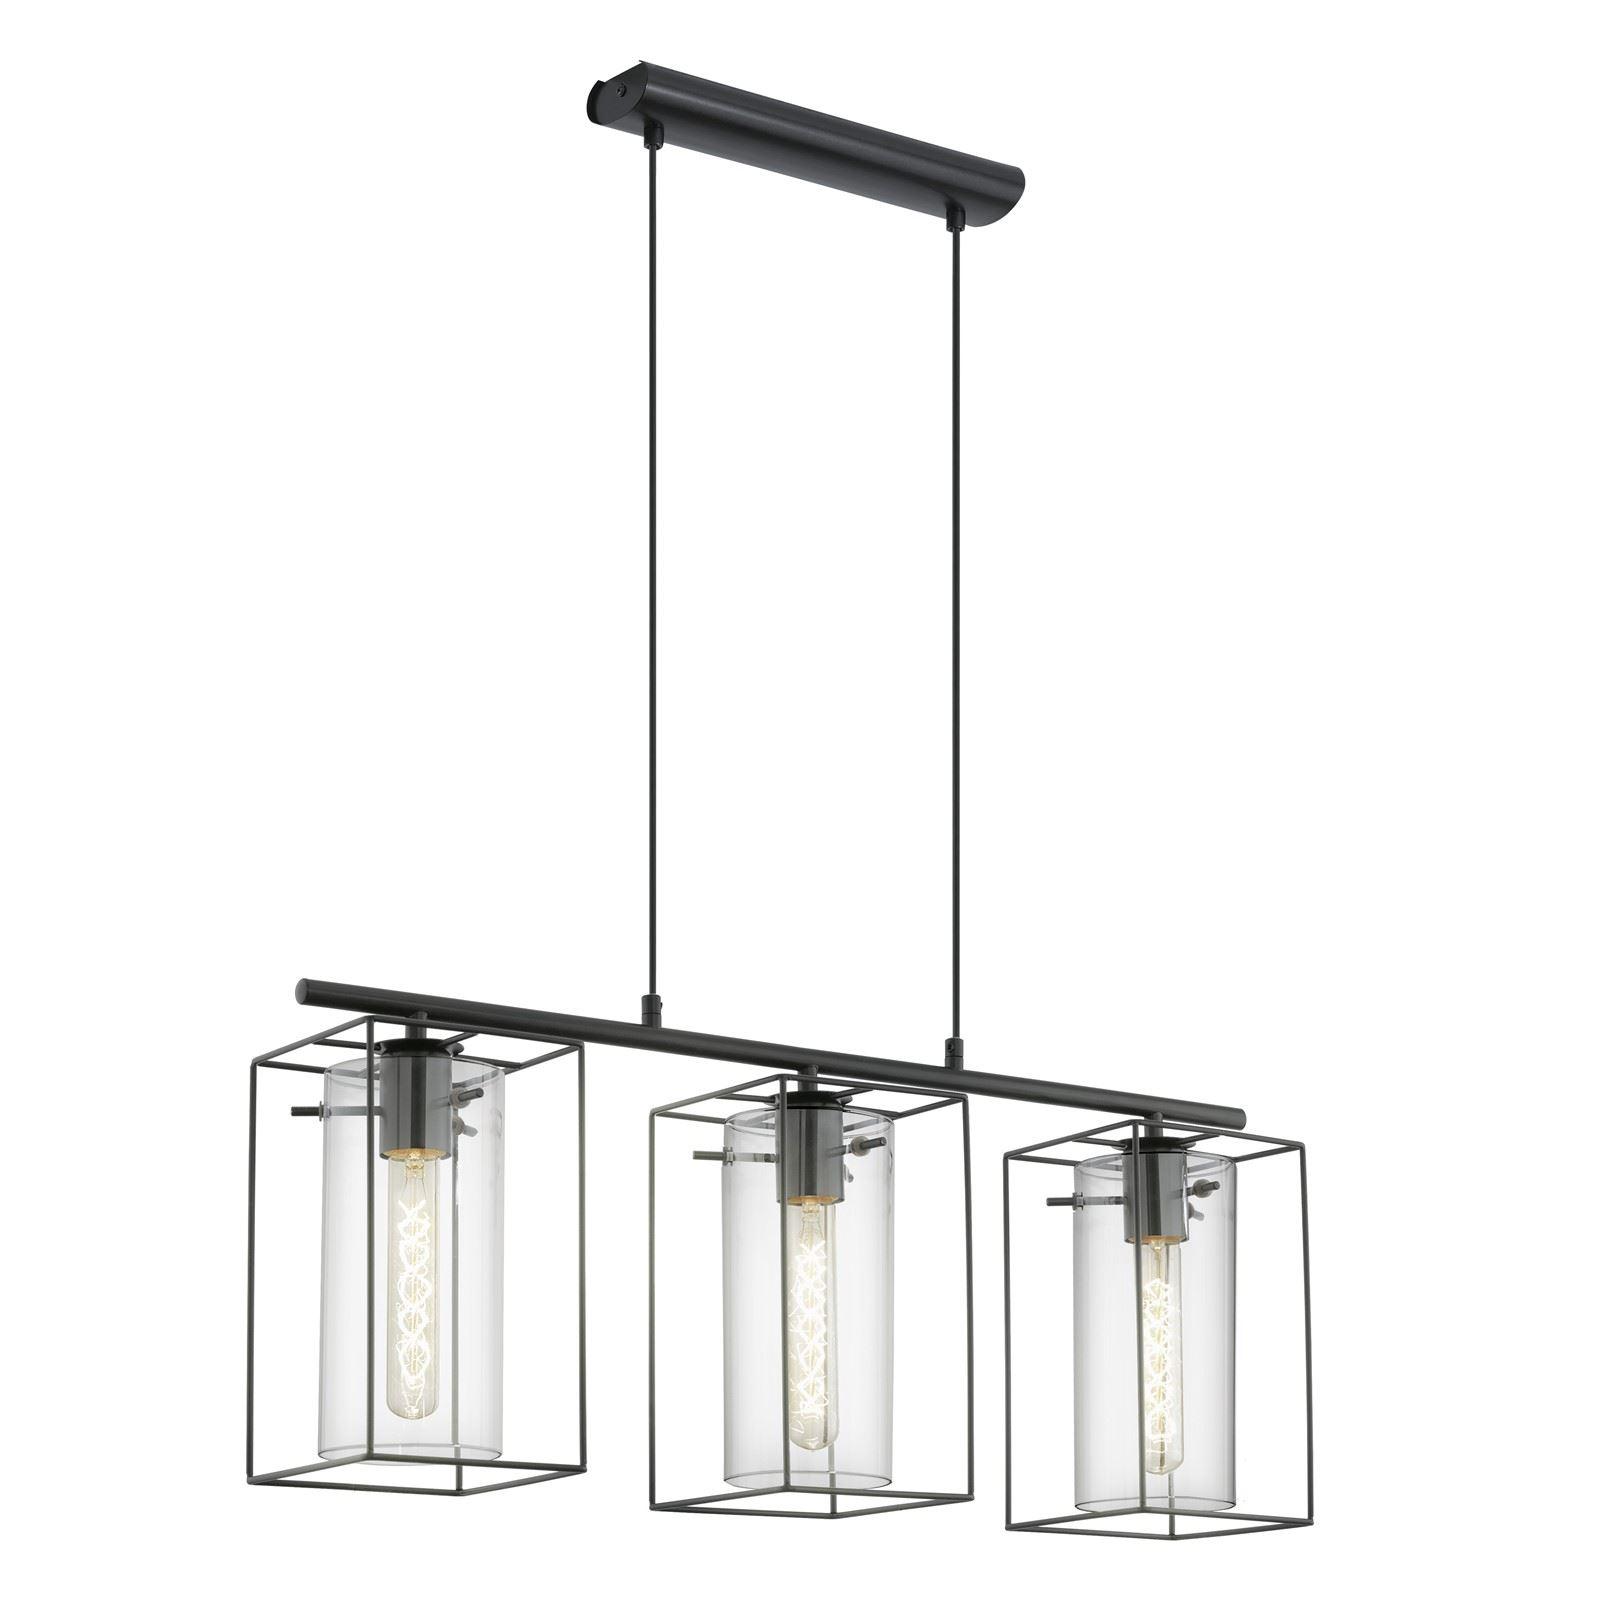 Loncino Hanging Pendant Light E27 Black 3 Lights